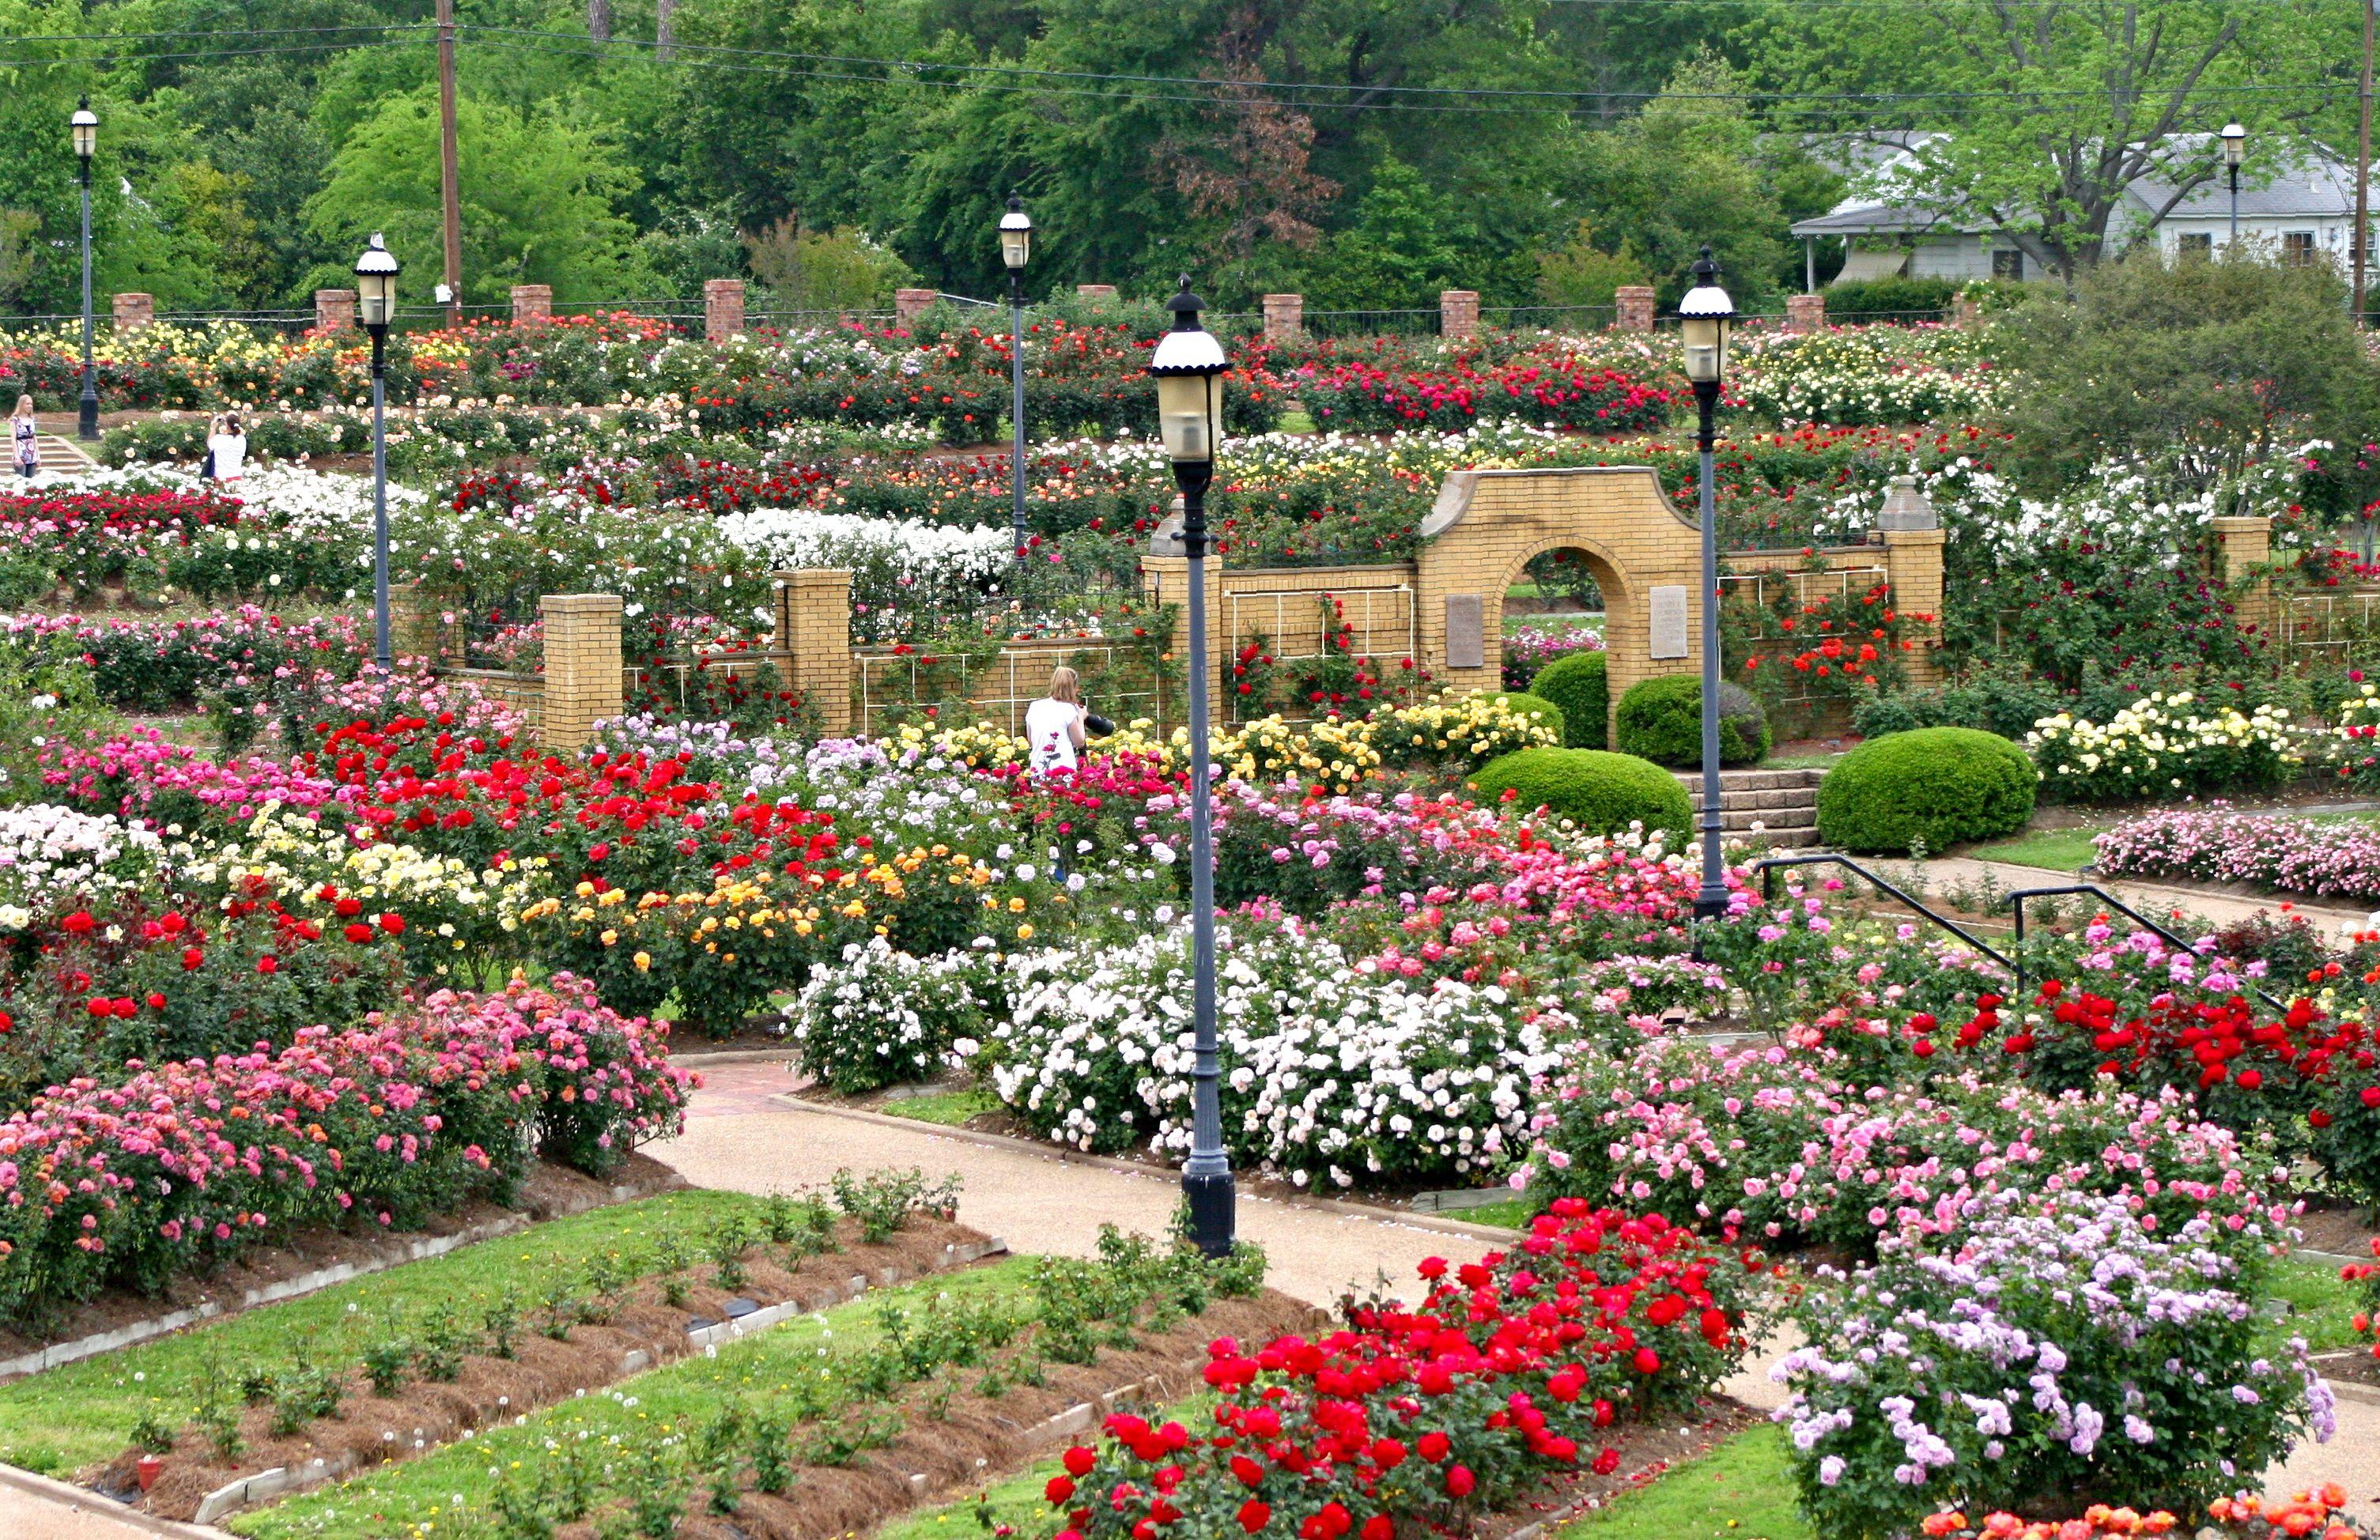 Tyler, Texas Rose Garden: One Of The Largest Rose Gardens